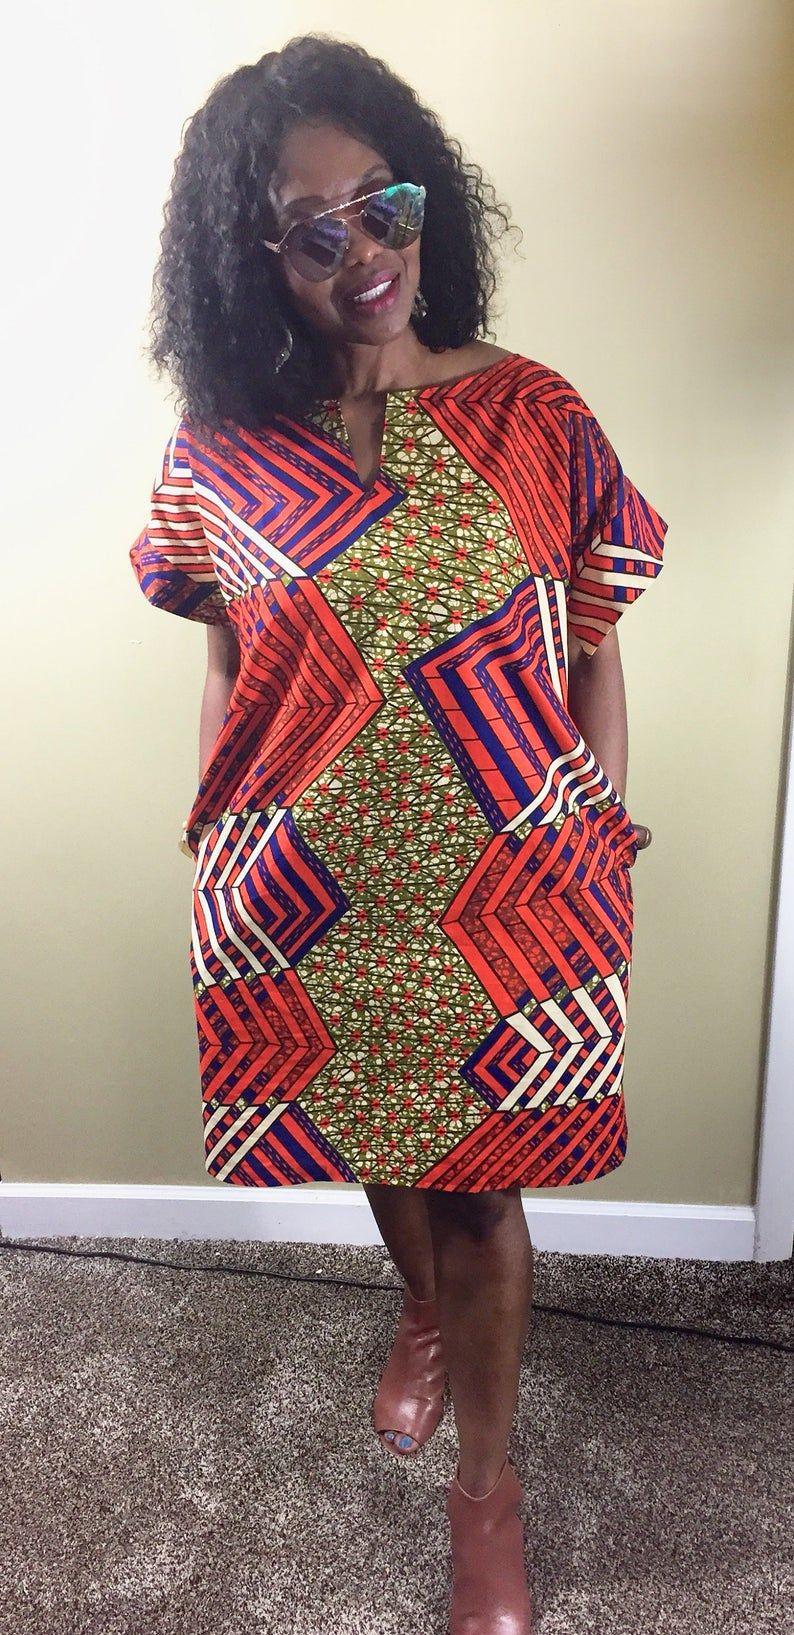 African Shirt Dress For Women African Print Dress Ankara Midi Dress With Pockets Orange Vibrant Summer Dress African Fashion Skirts Latest African Fashion Dresses African Shirt Dress [ 1635 x 794 Pixel ]